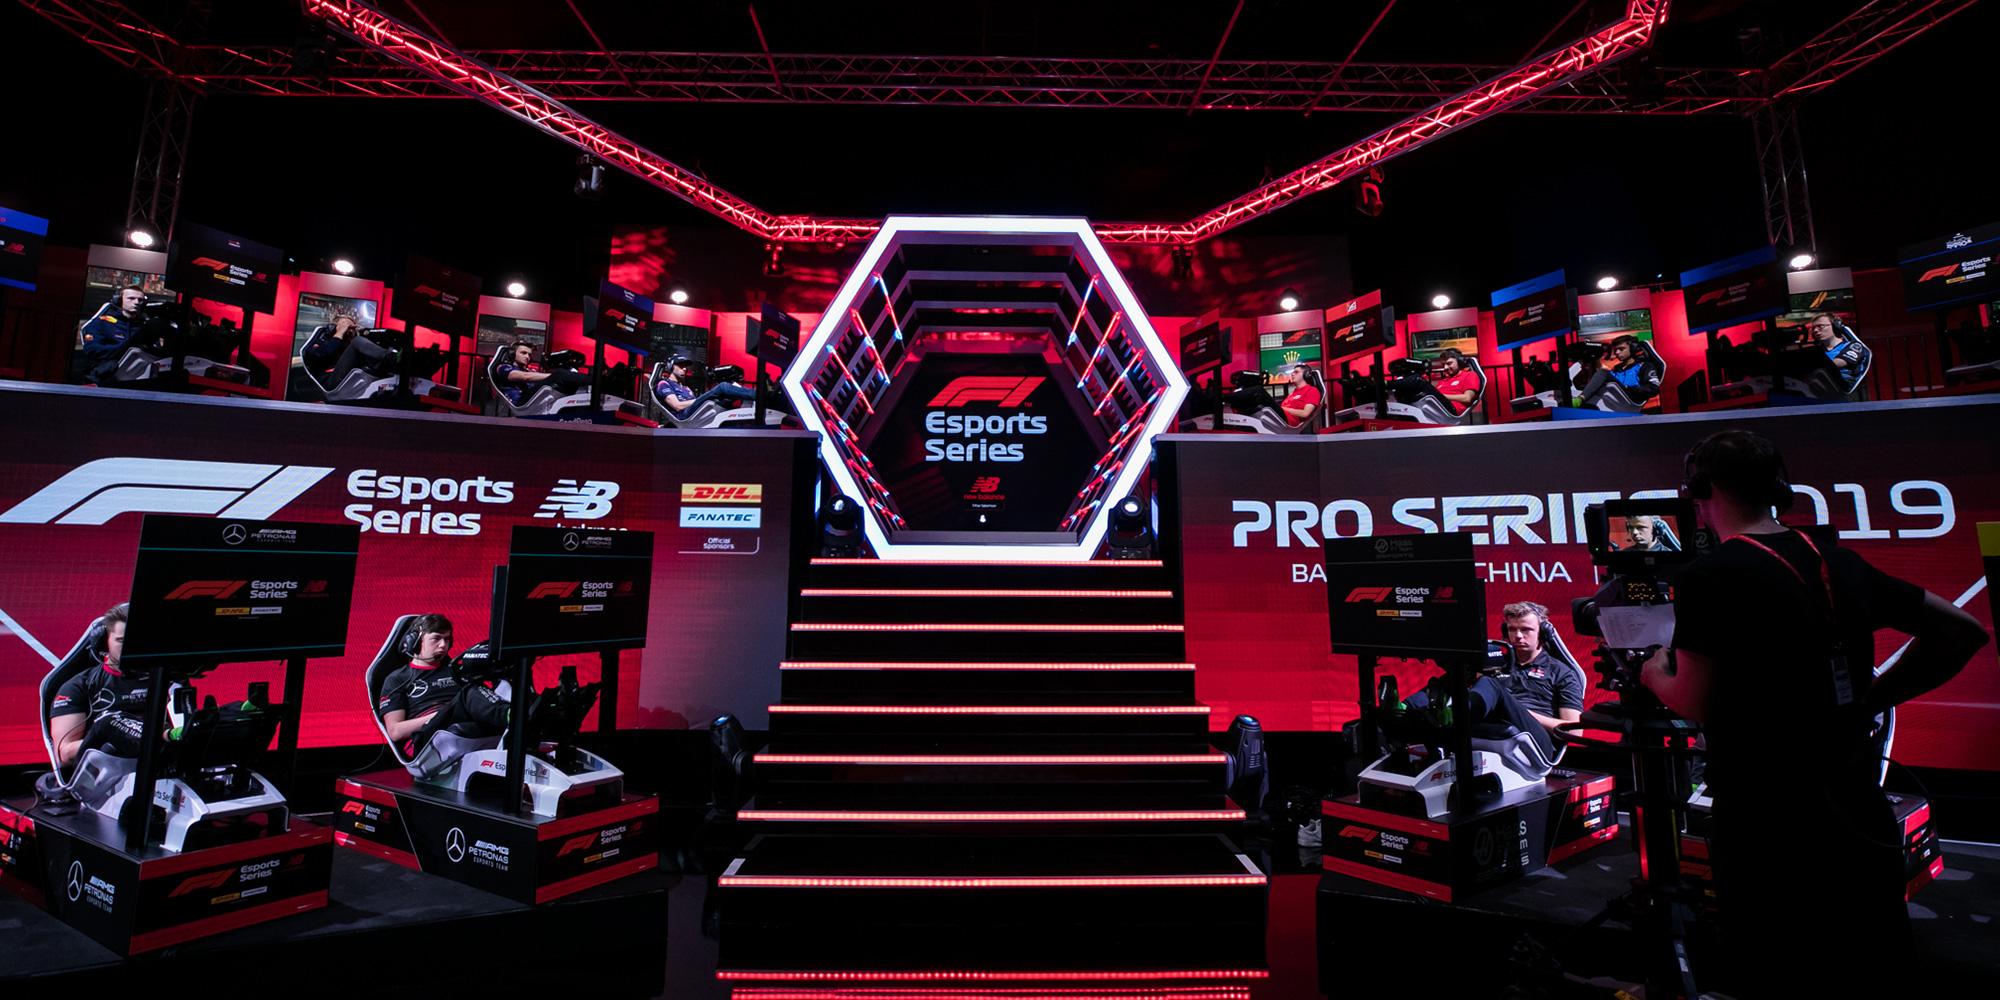 Esports 2019 – Event 1 7